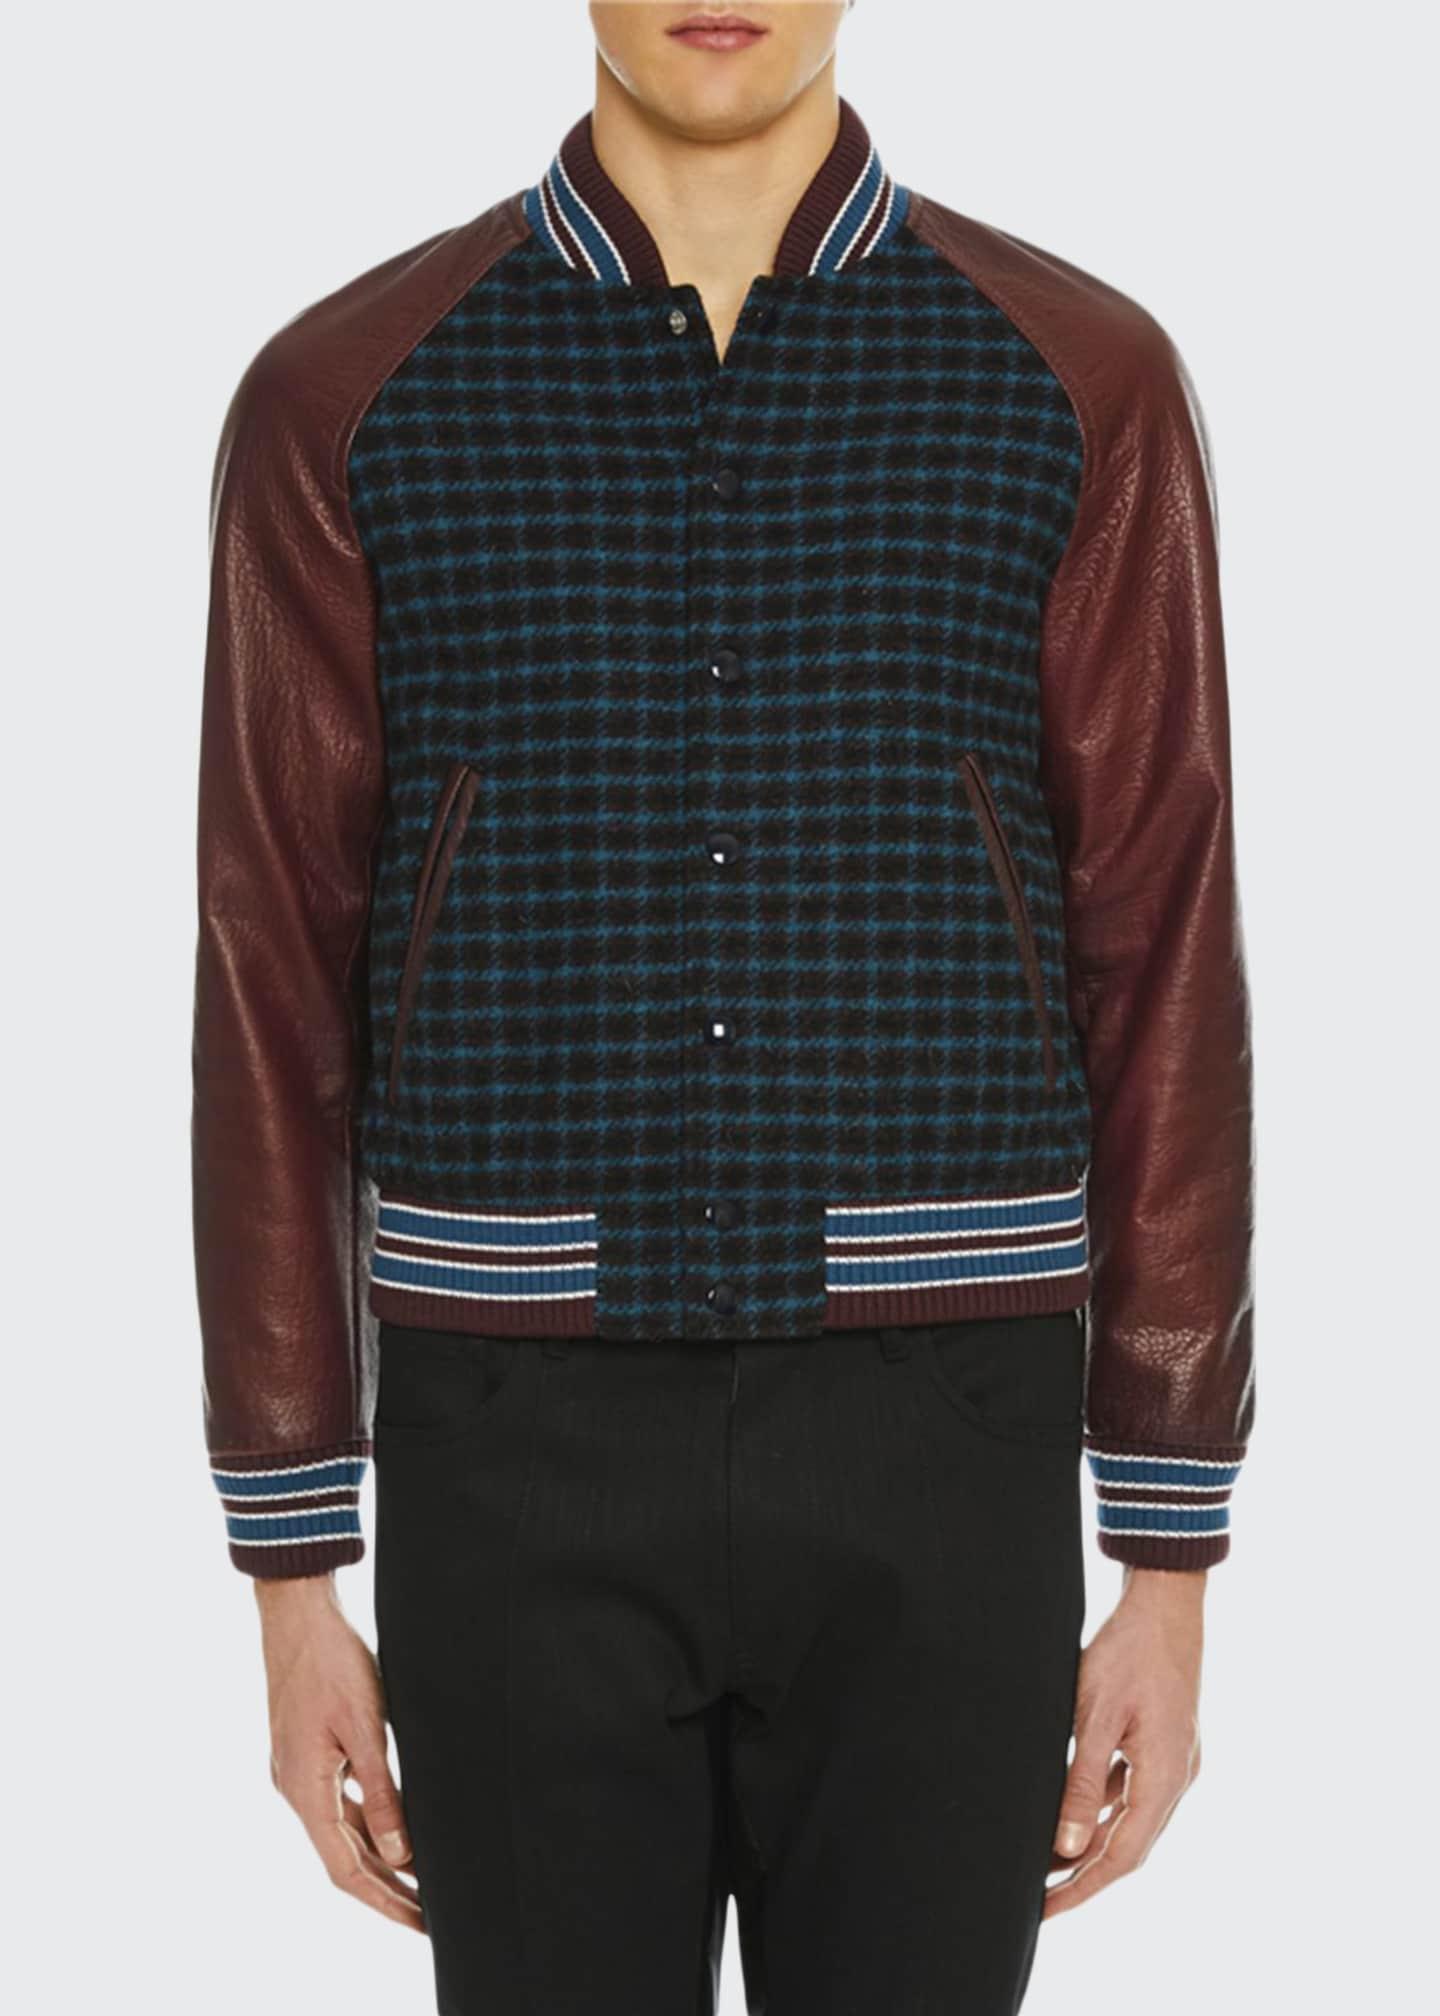 Prada Men's Leather-Trim Grid-Pattern Bomber Jacket